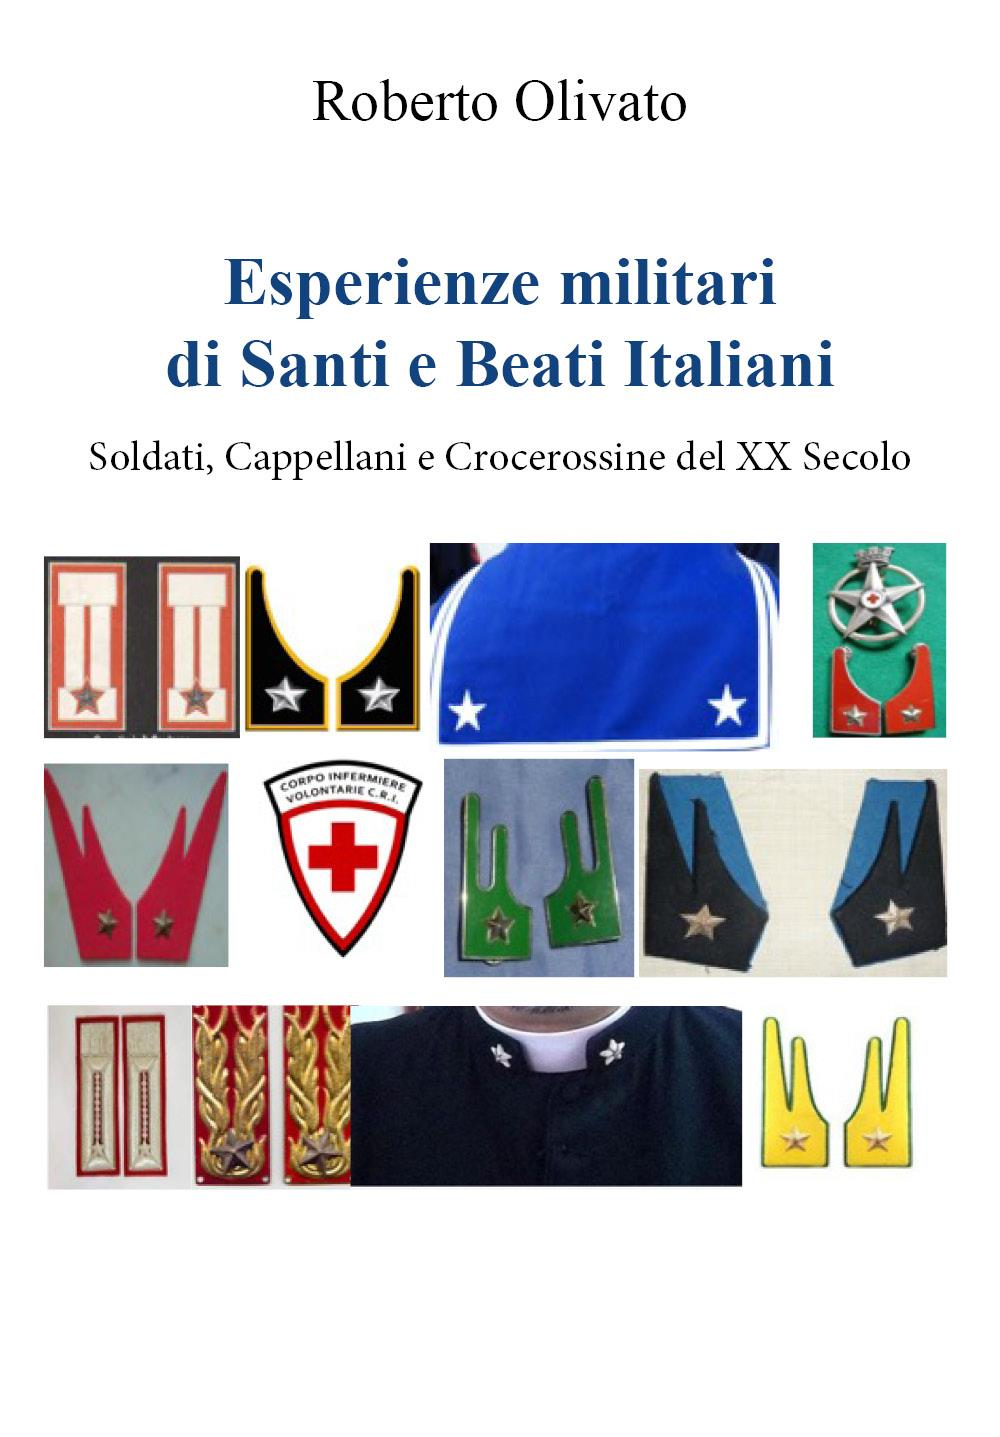 Esperienze militari di Santi e Beati Italiani